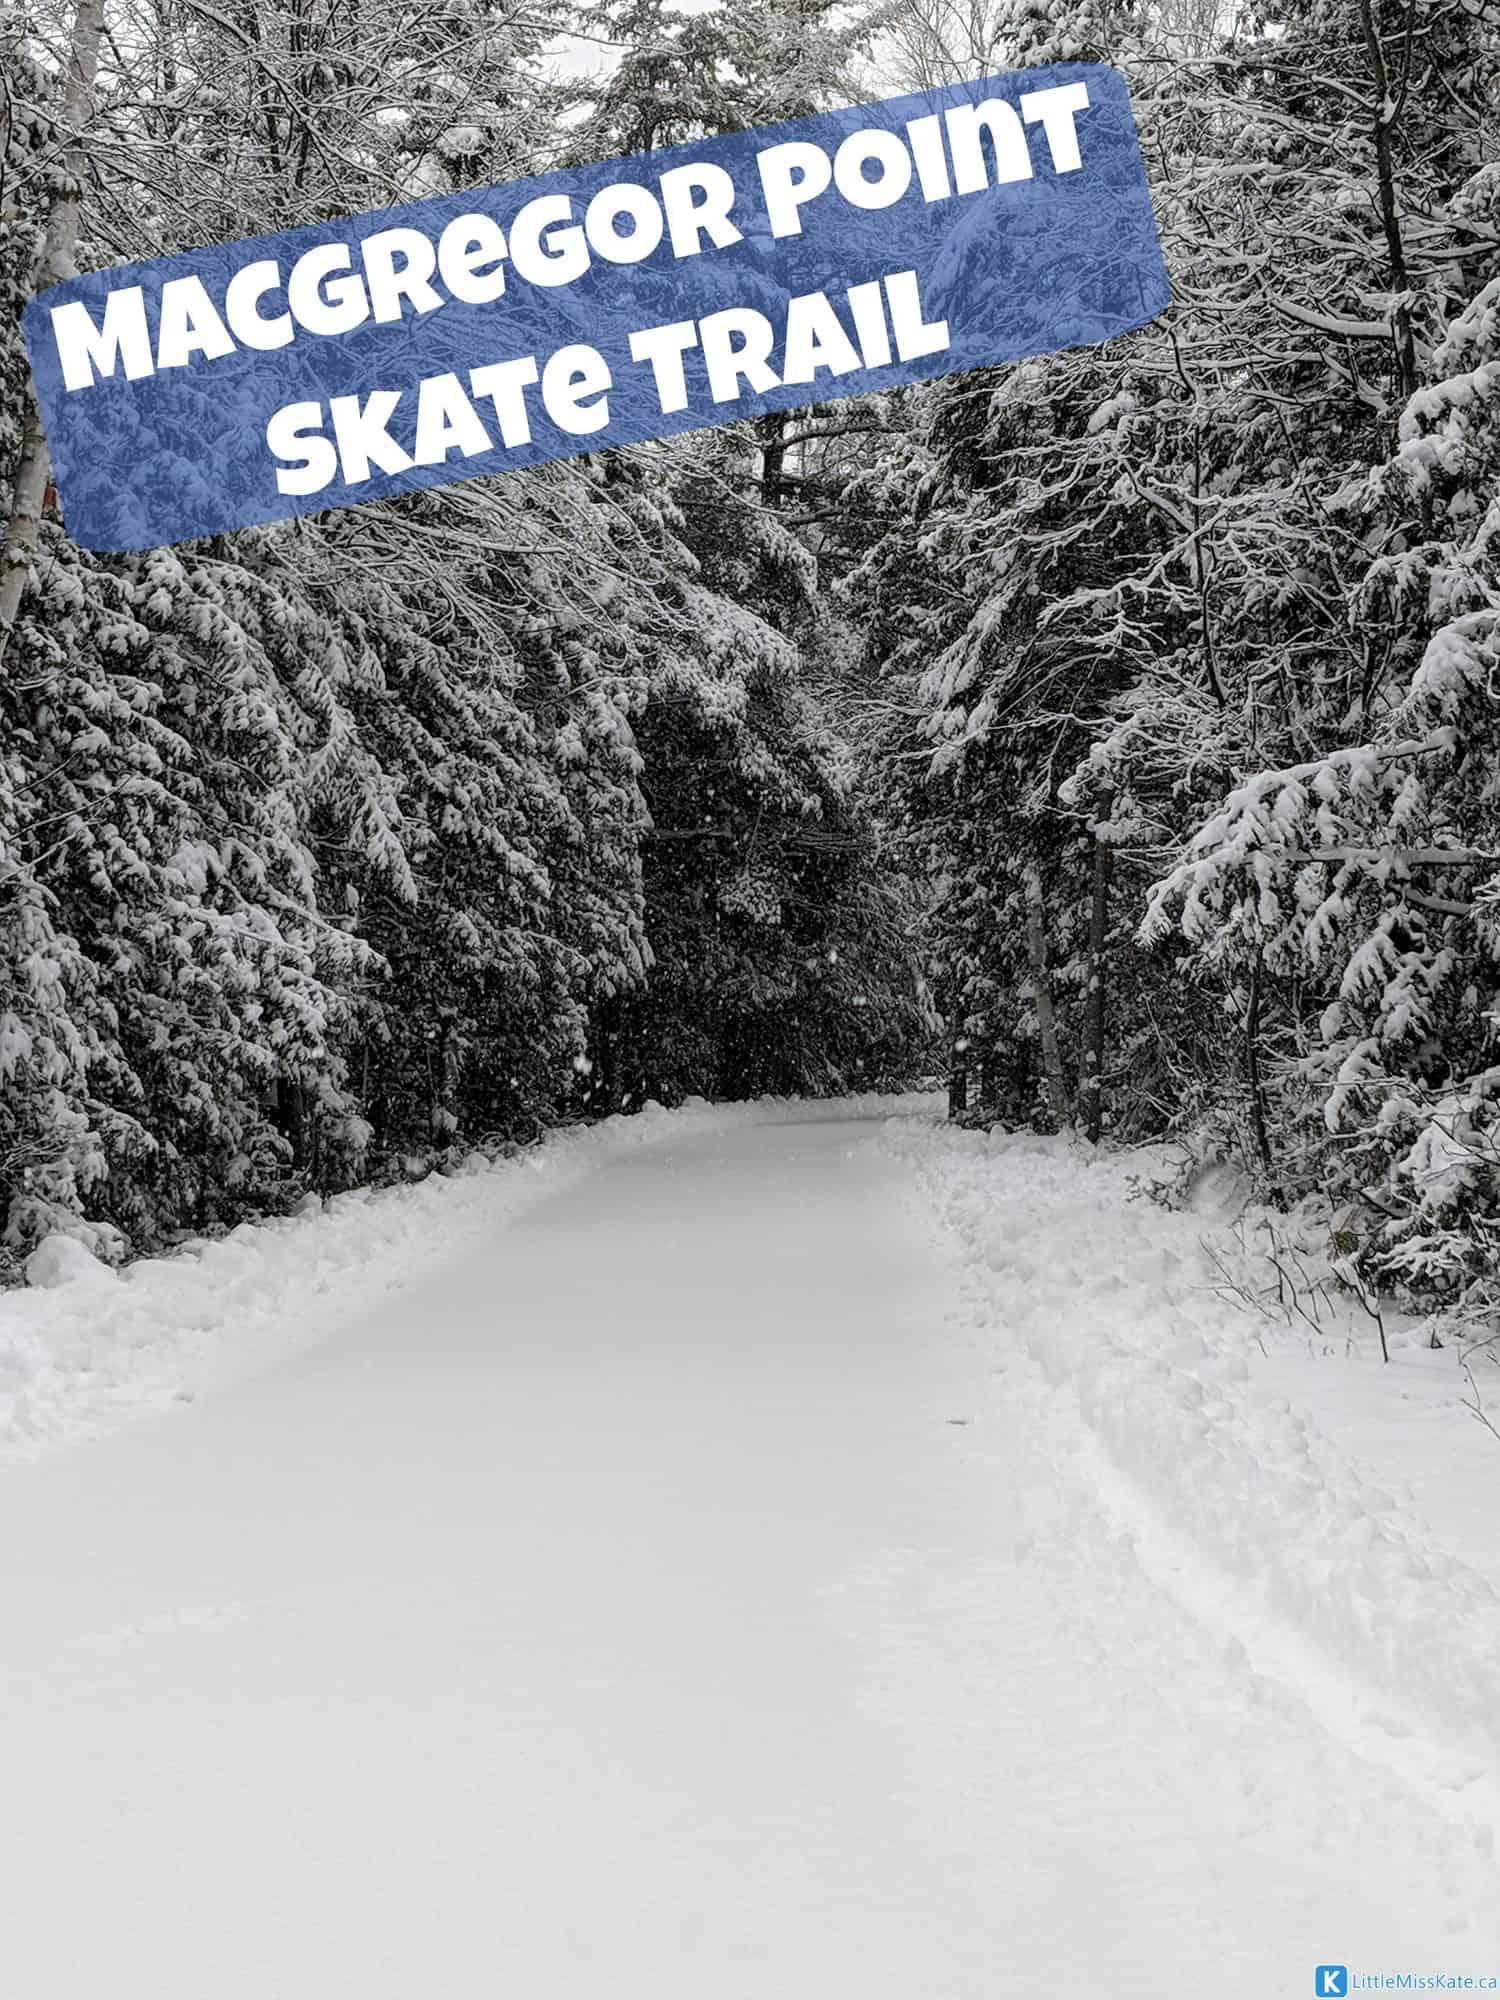 MacGregor Point skating outdoor skate trail ontario